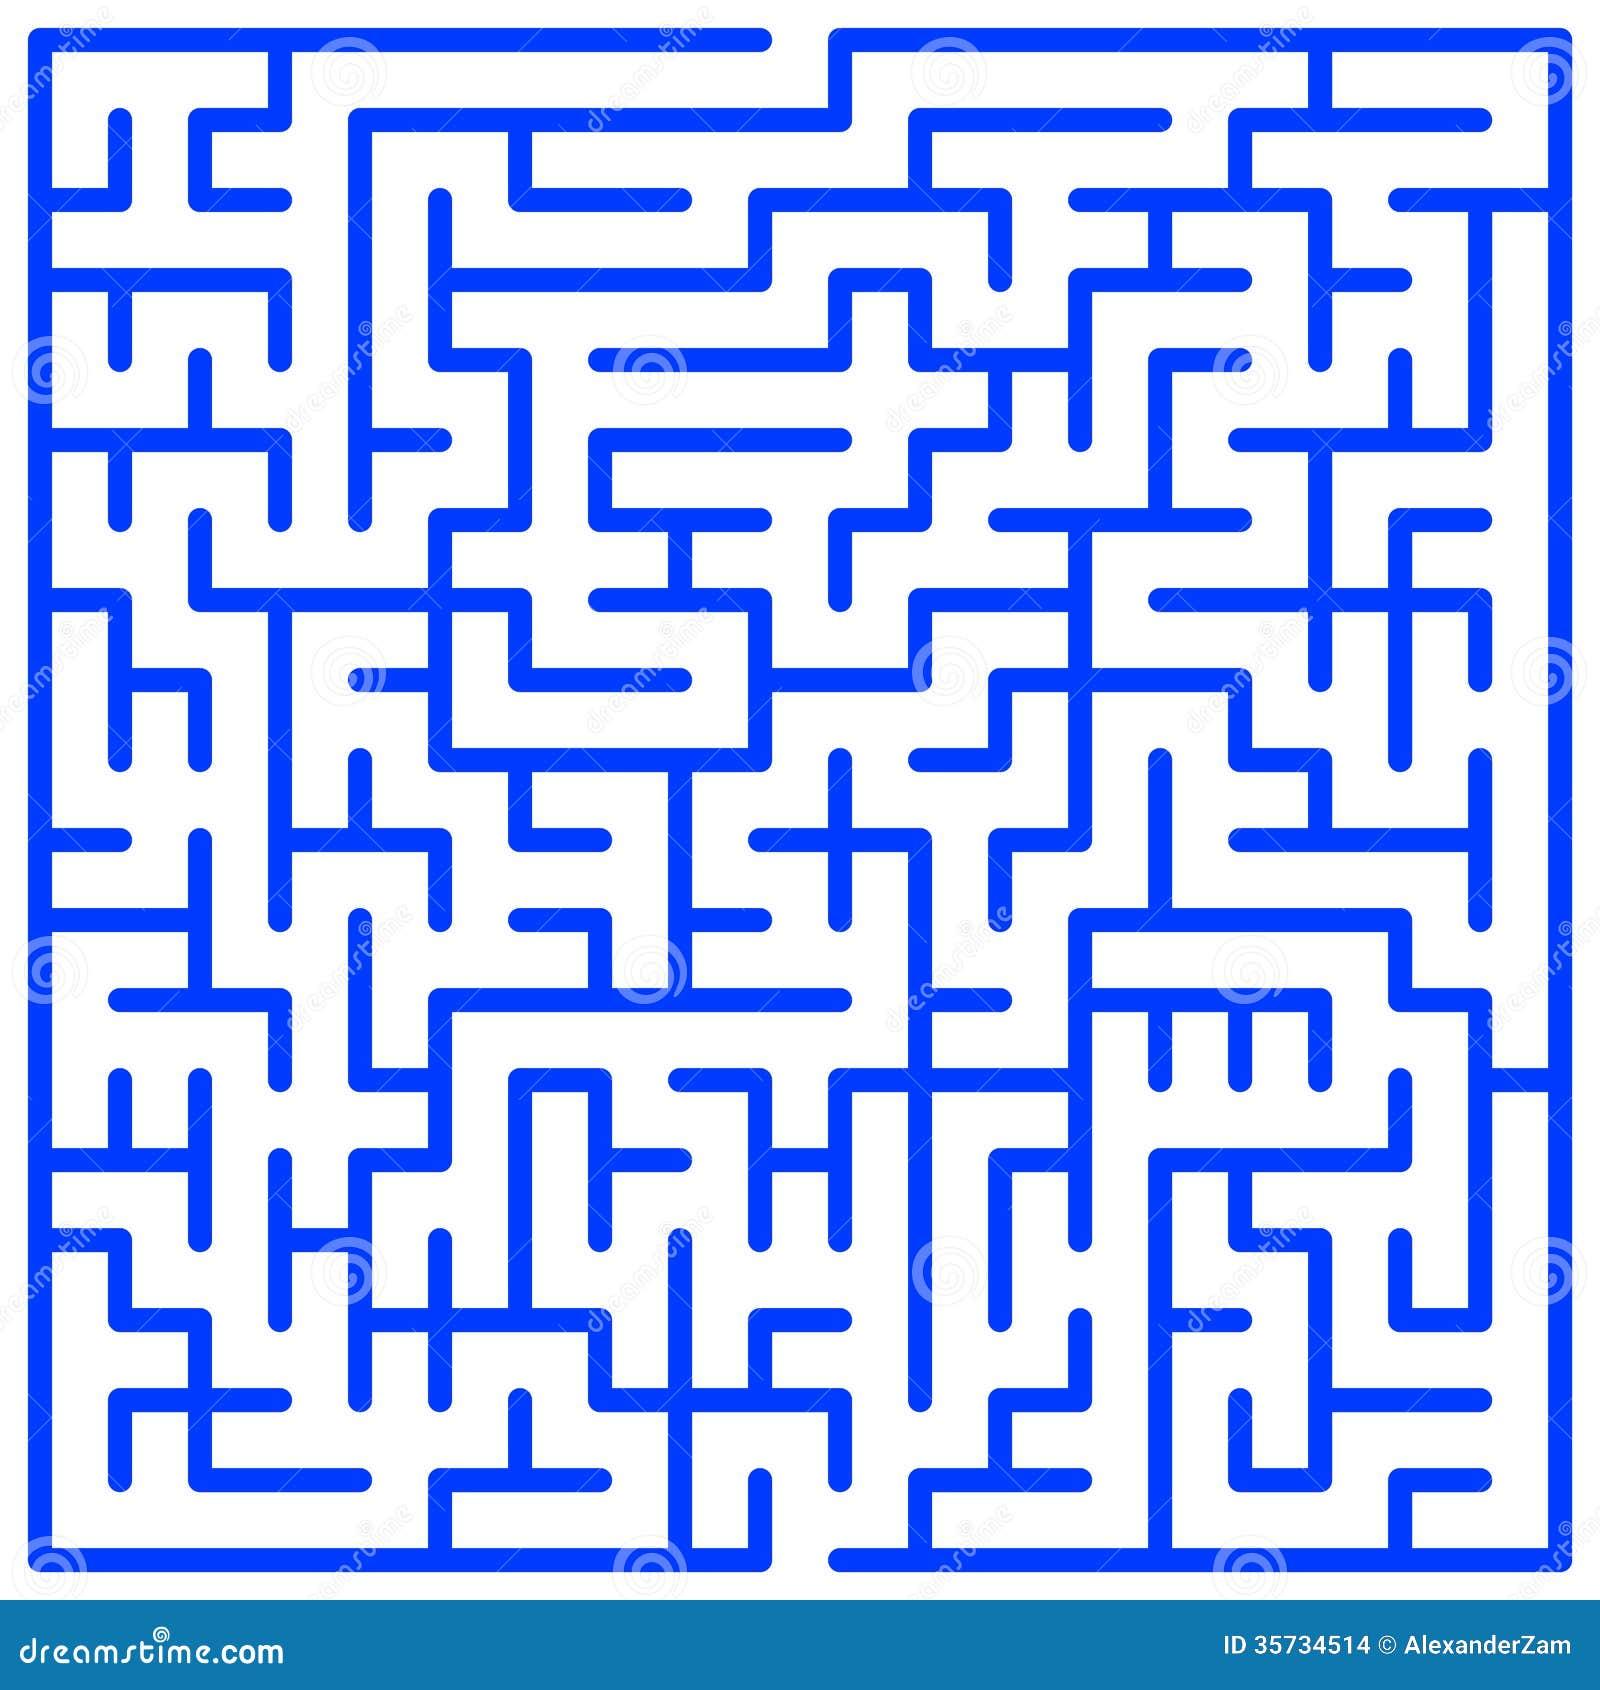 Maze Stock Images Image 35734514